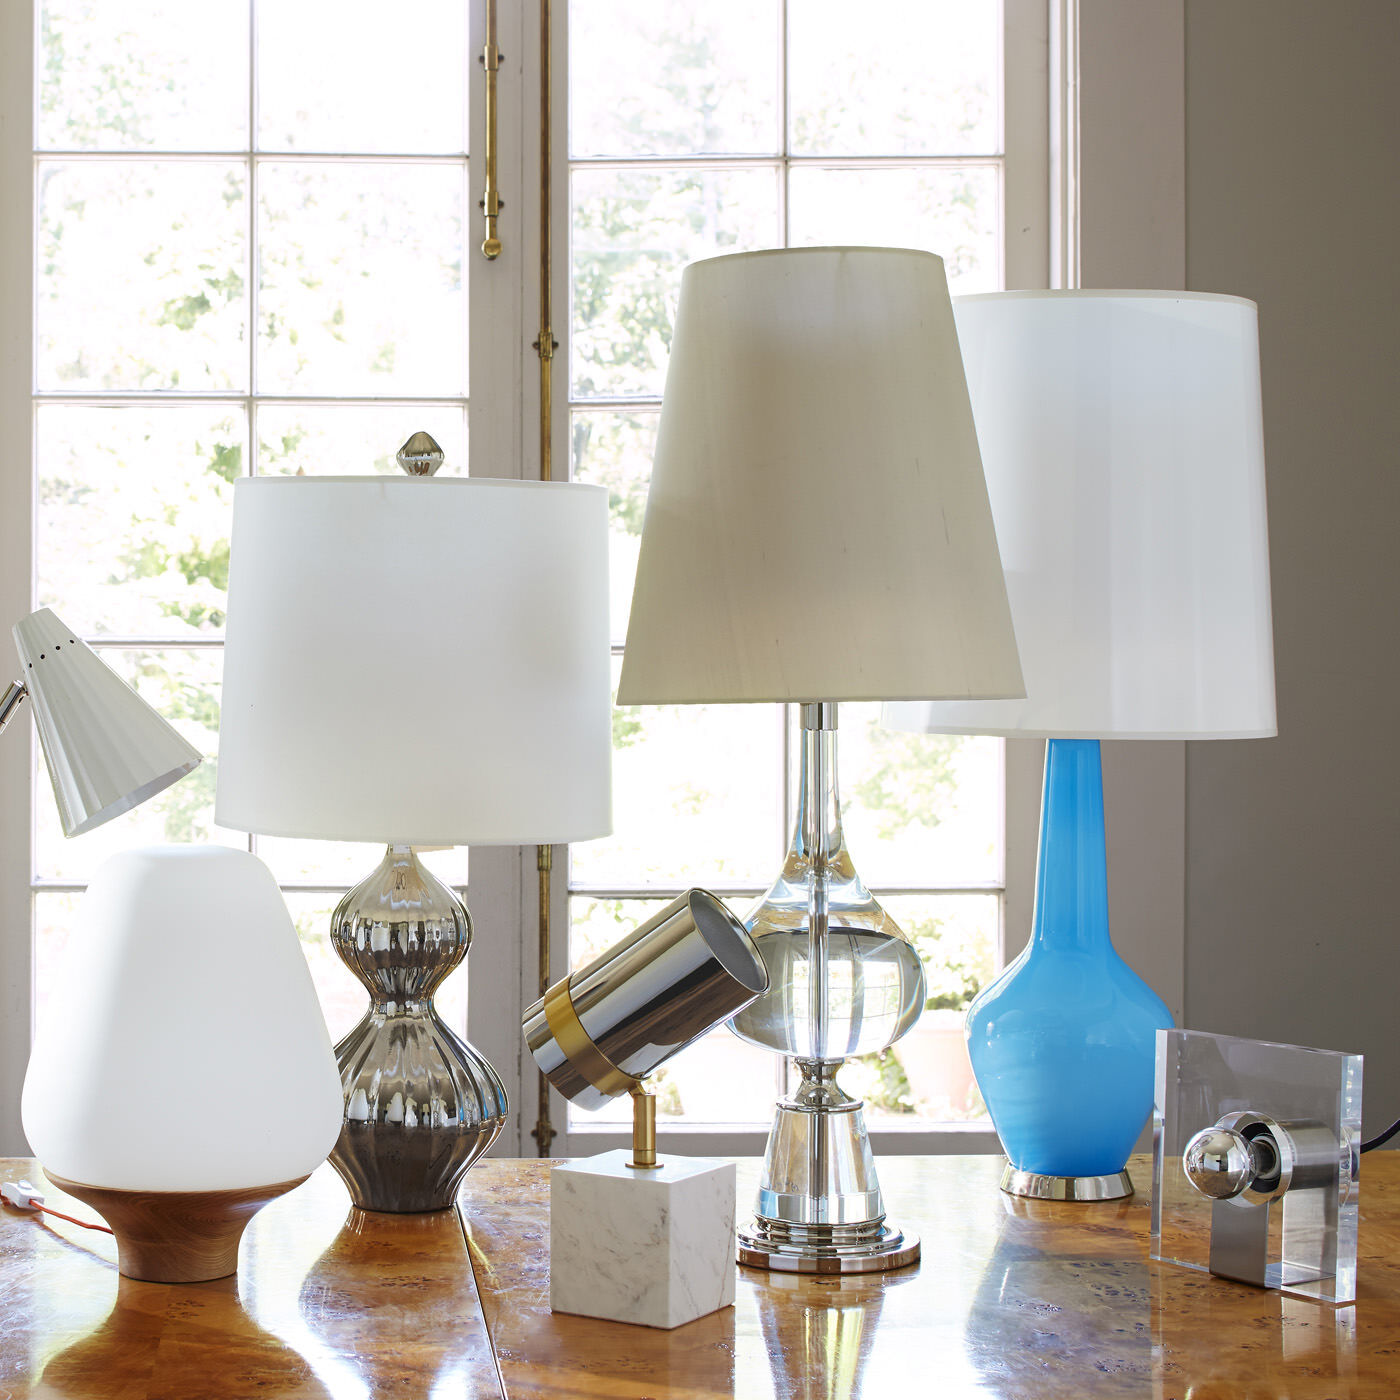 Table L&s - Claridge Genie Table L& & Claridge Genie Table Lamp   Modern Table Lamps   Jonathan Adler azcodes.com